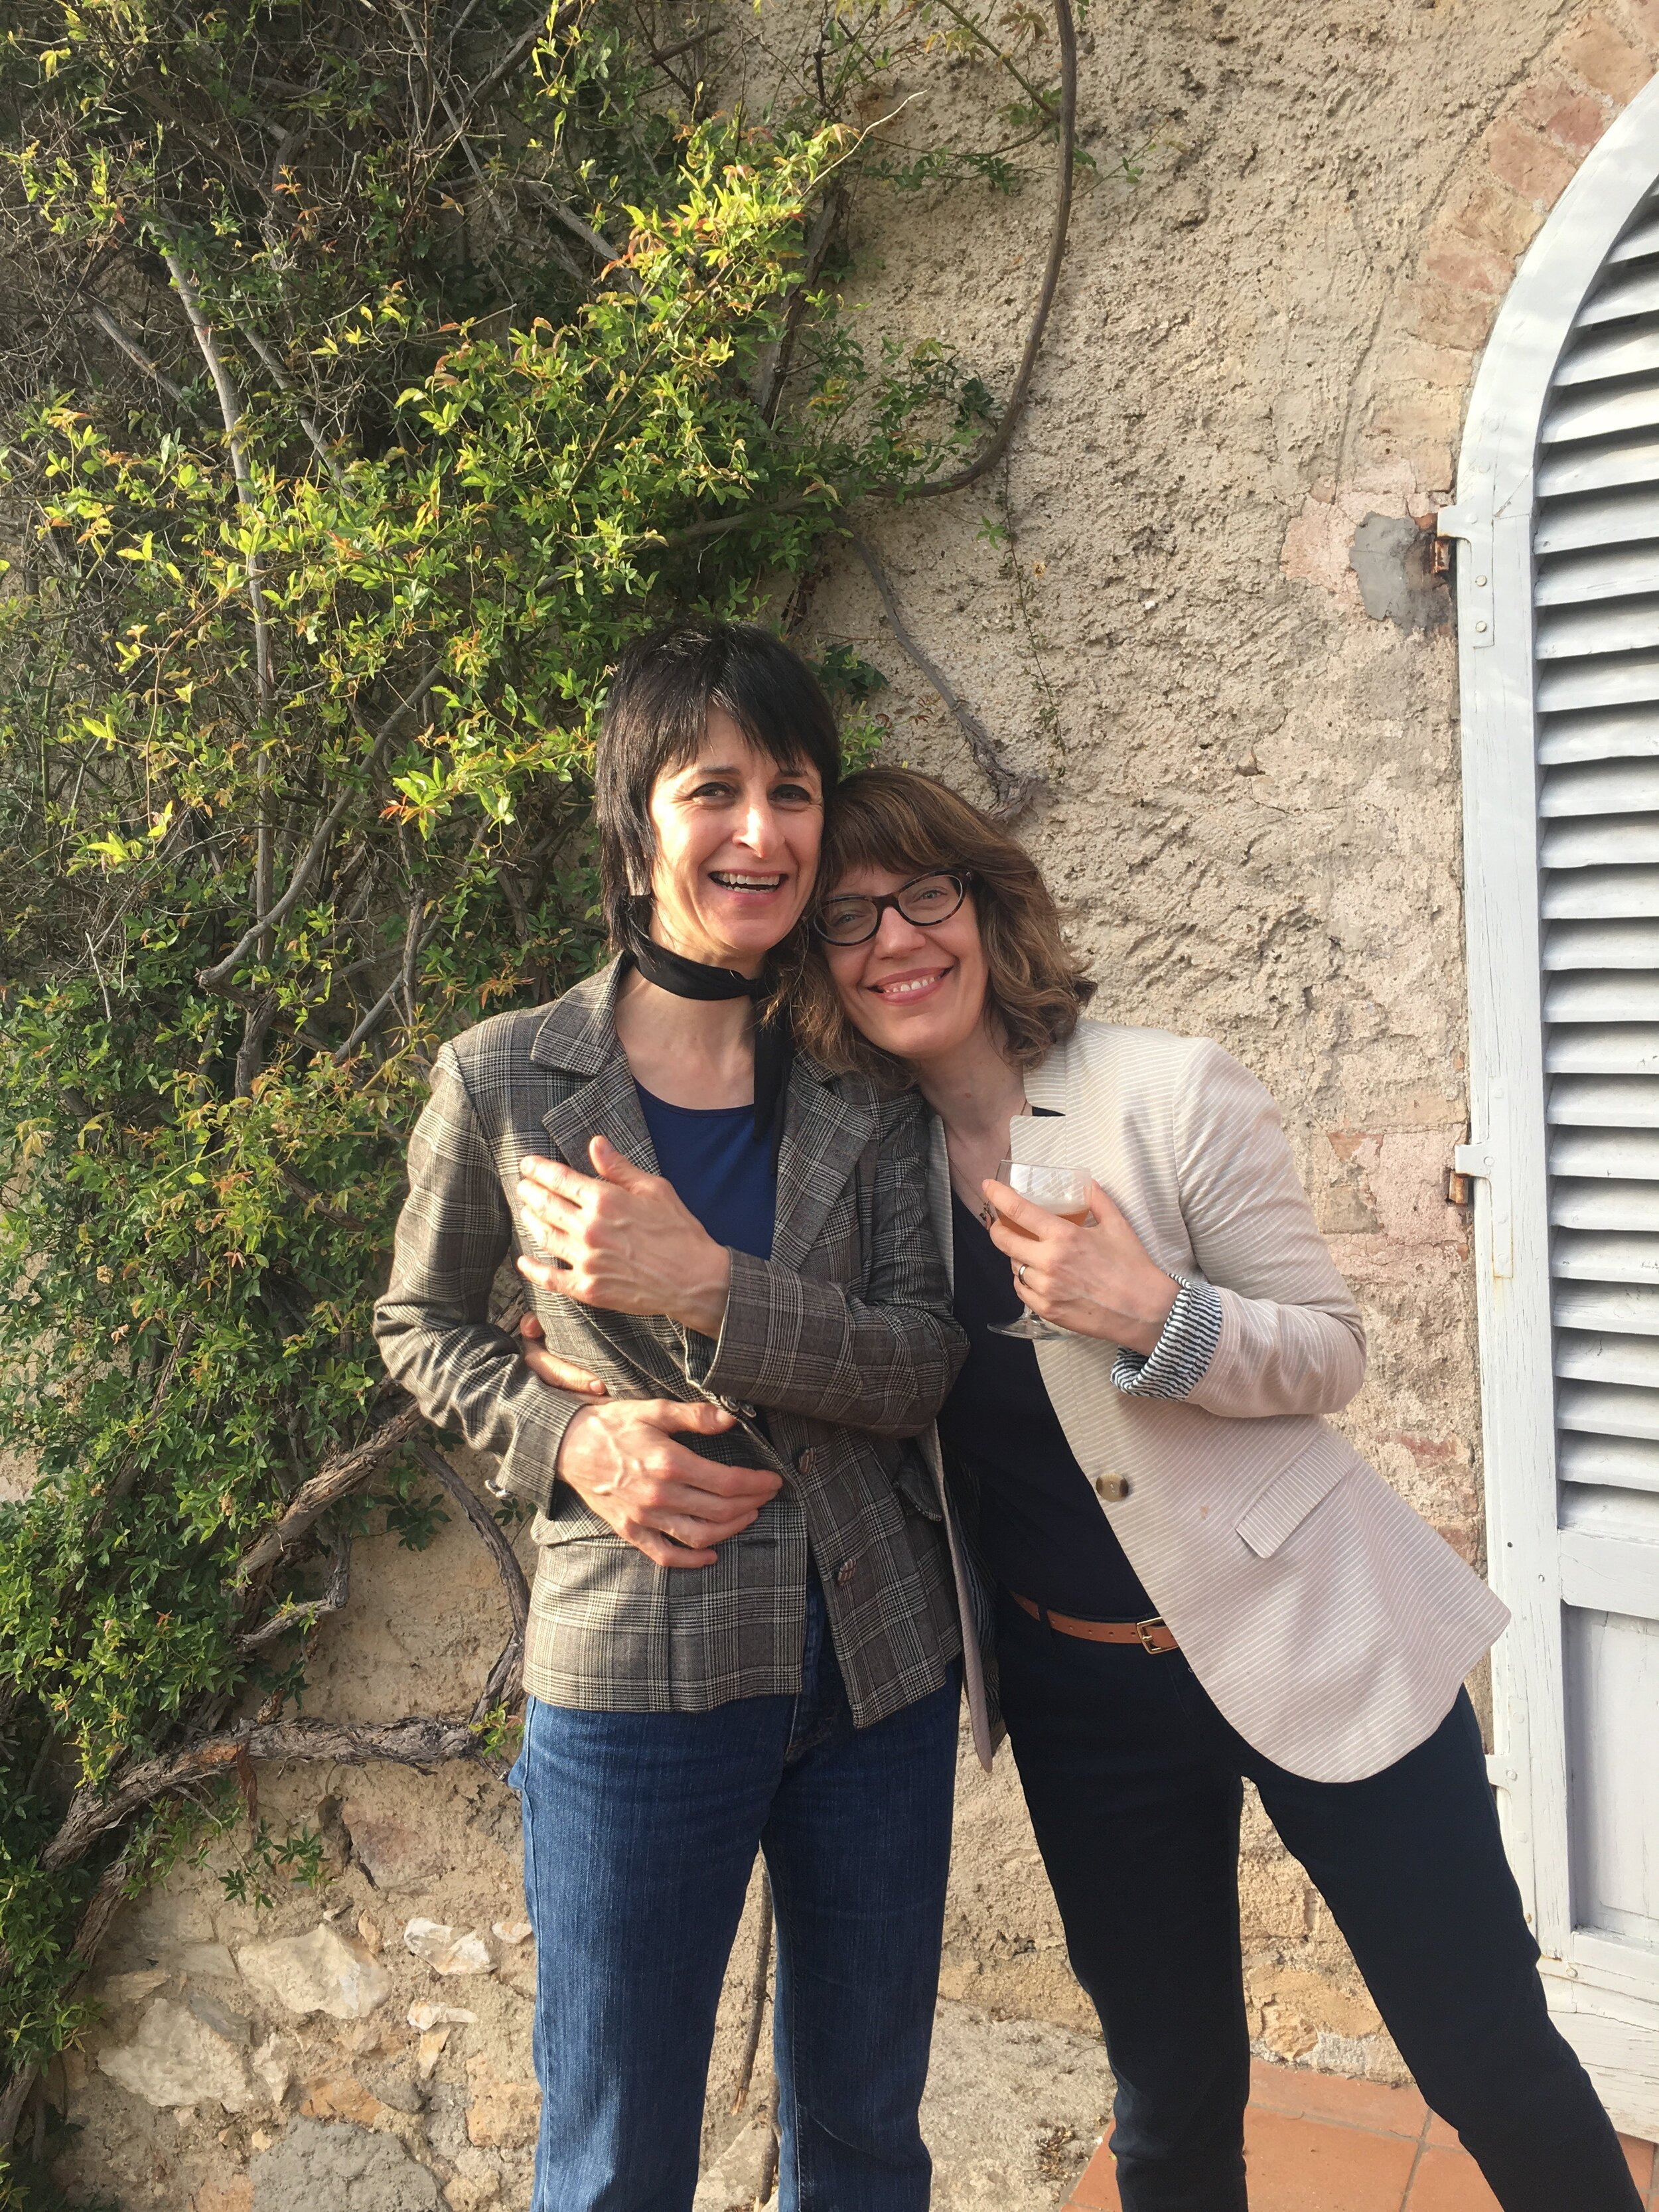 Visiting Lecturer, Franca Marini with IDSVA Director, Simonetta Moro. June 2019